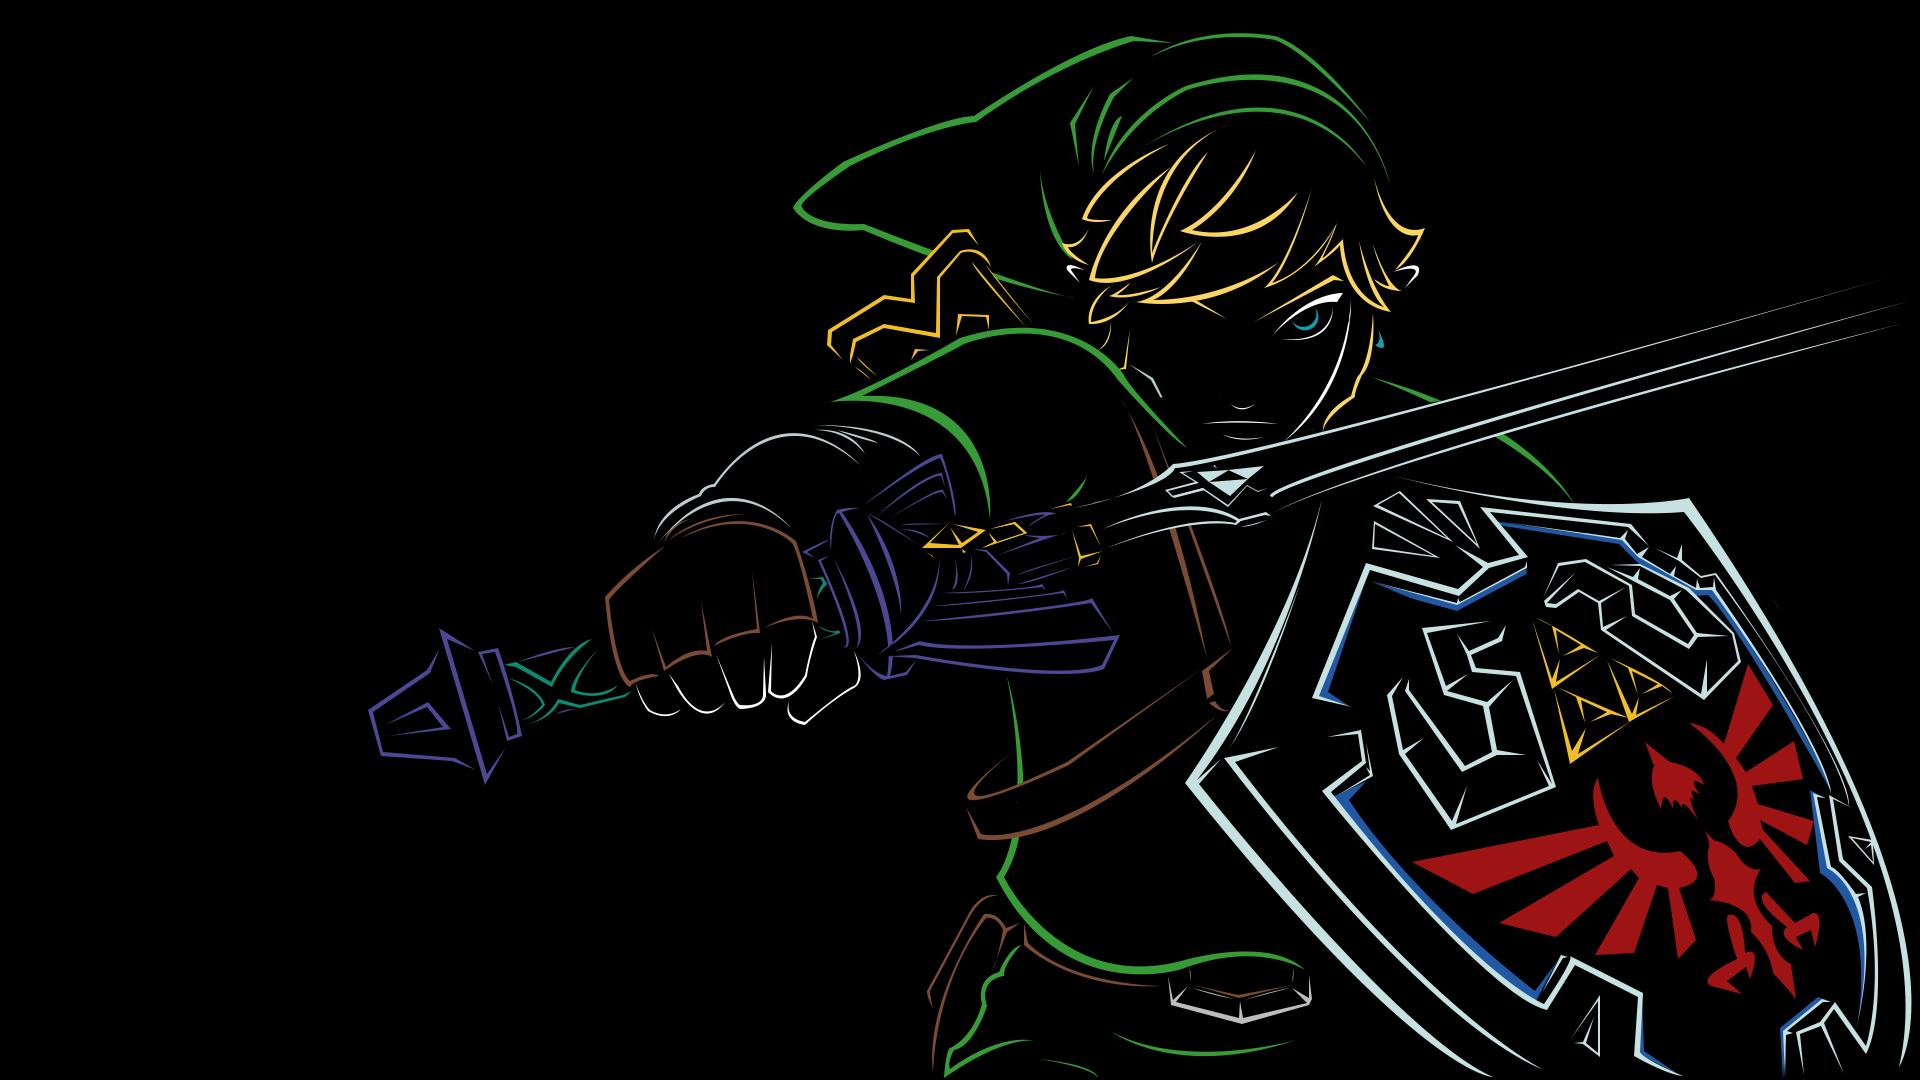 Awesome Zelda Wallpaper 47308 1920x1080px 1920x1080